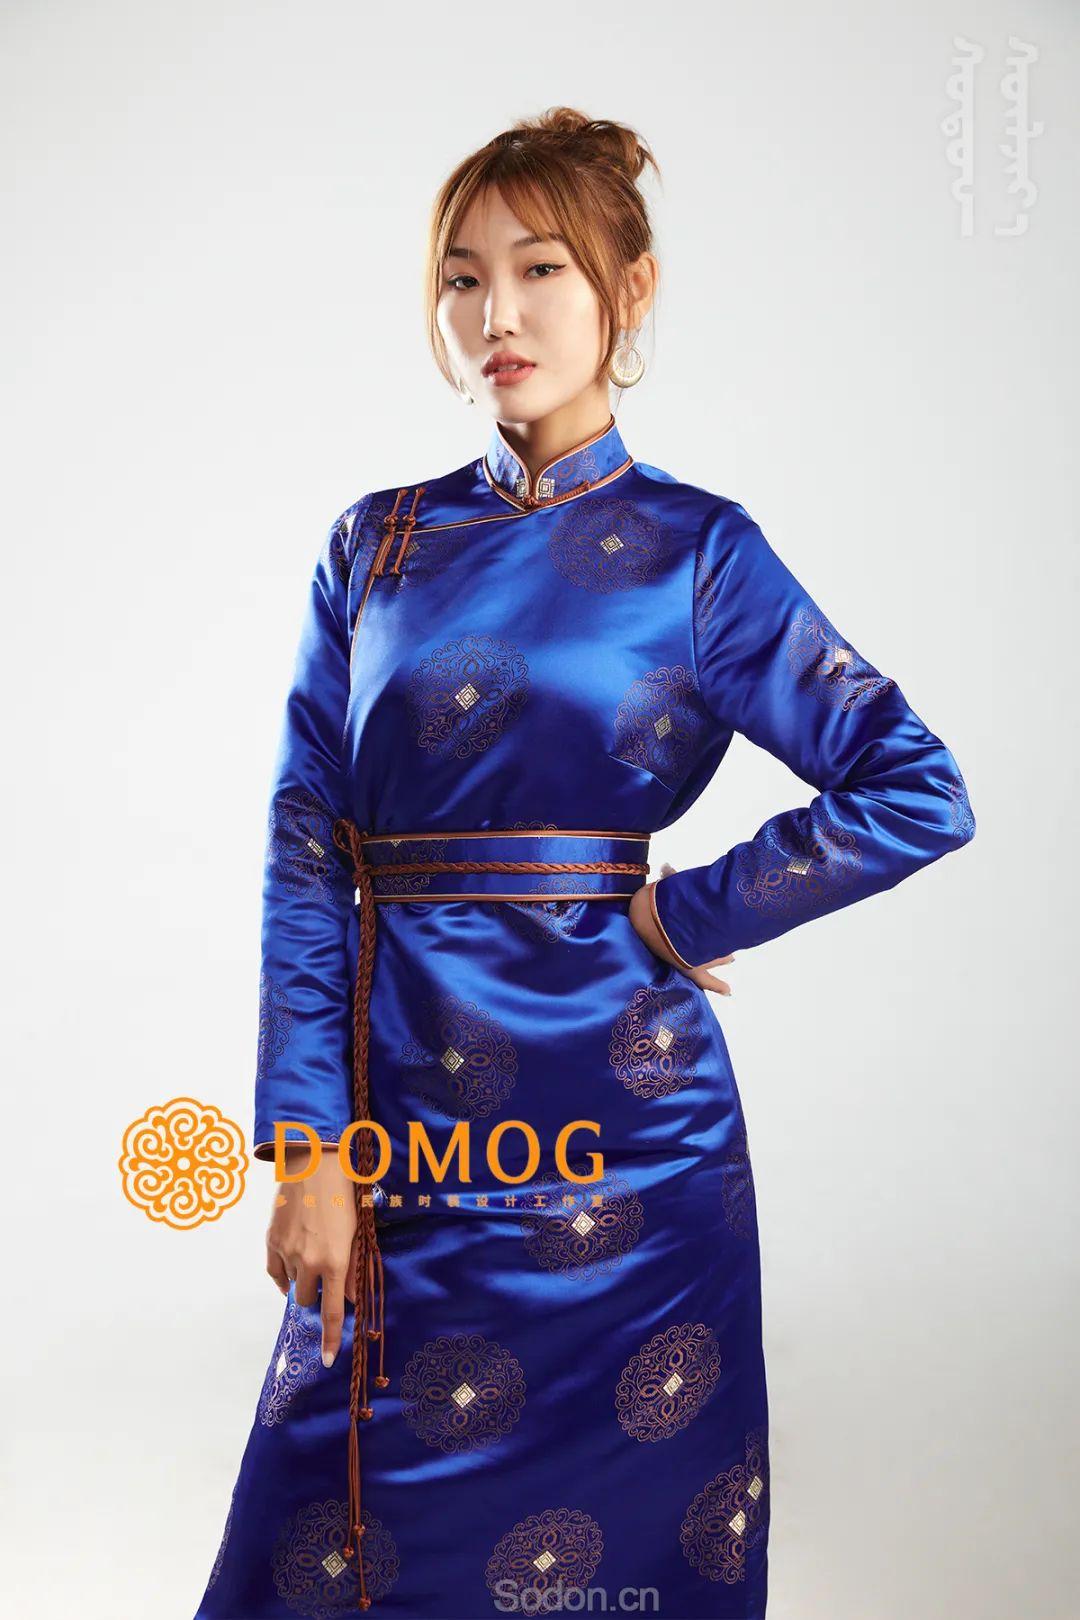 DOMOG 蒙古时装2020新款,民族与时尚的融合 第11张 DOMOG 蒙古时装2020新款,民族与时尚的融合 蒙古服饰